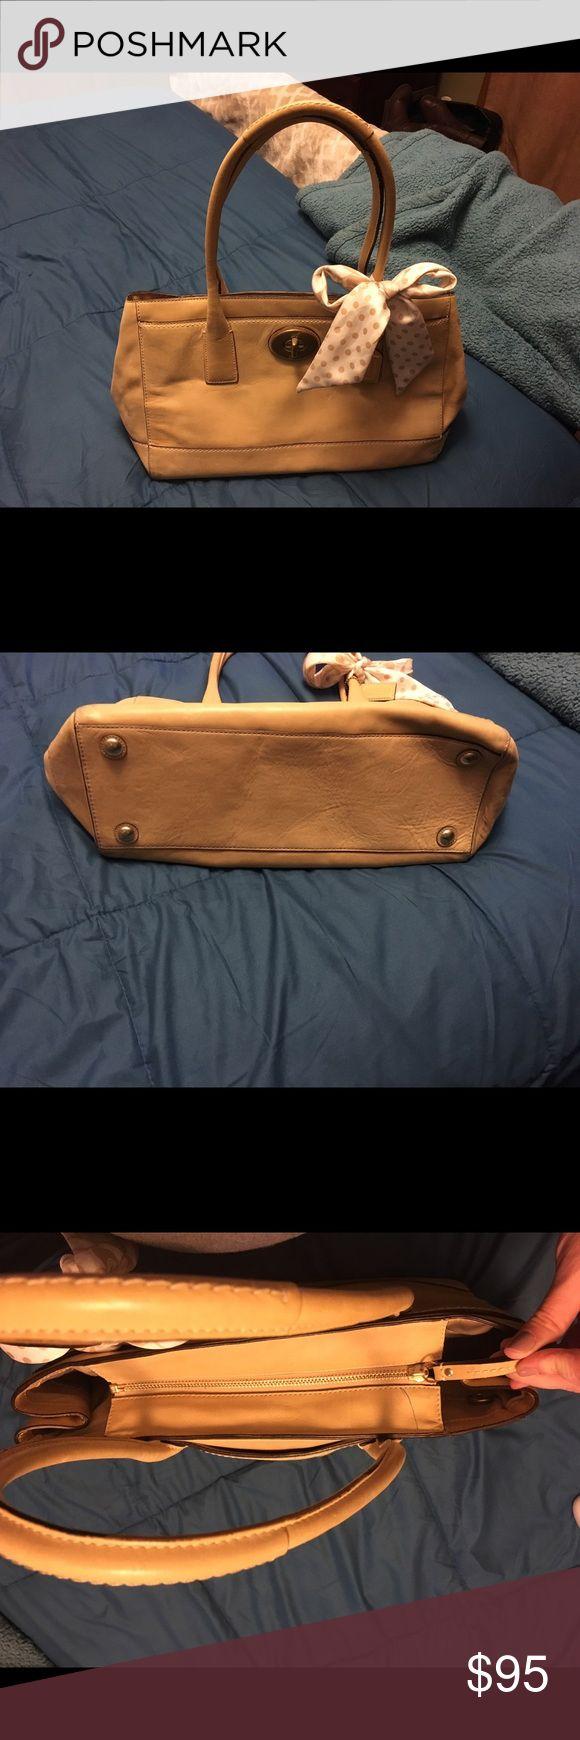 coach leather handbags outlet d7r0  Coach handbag